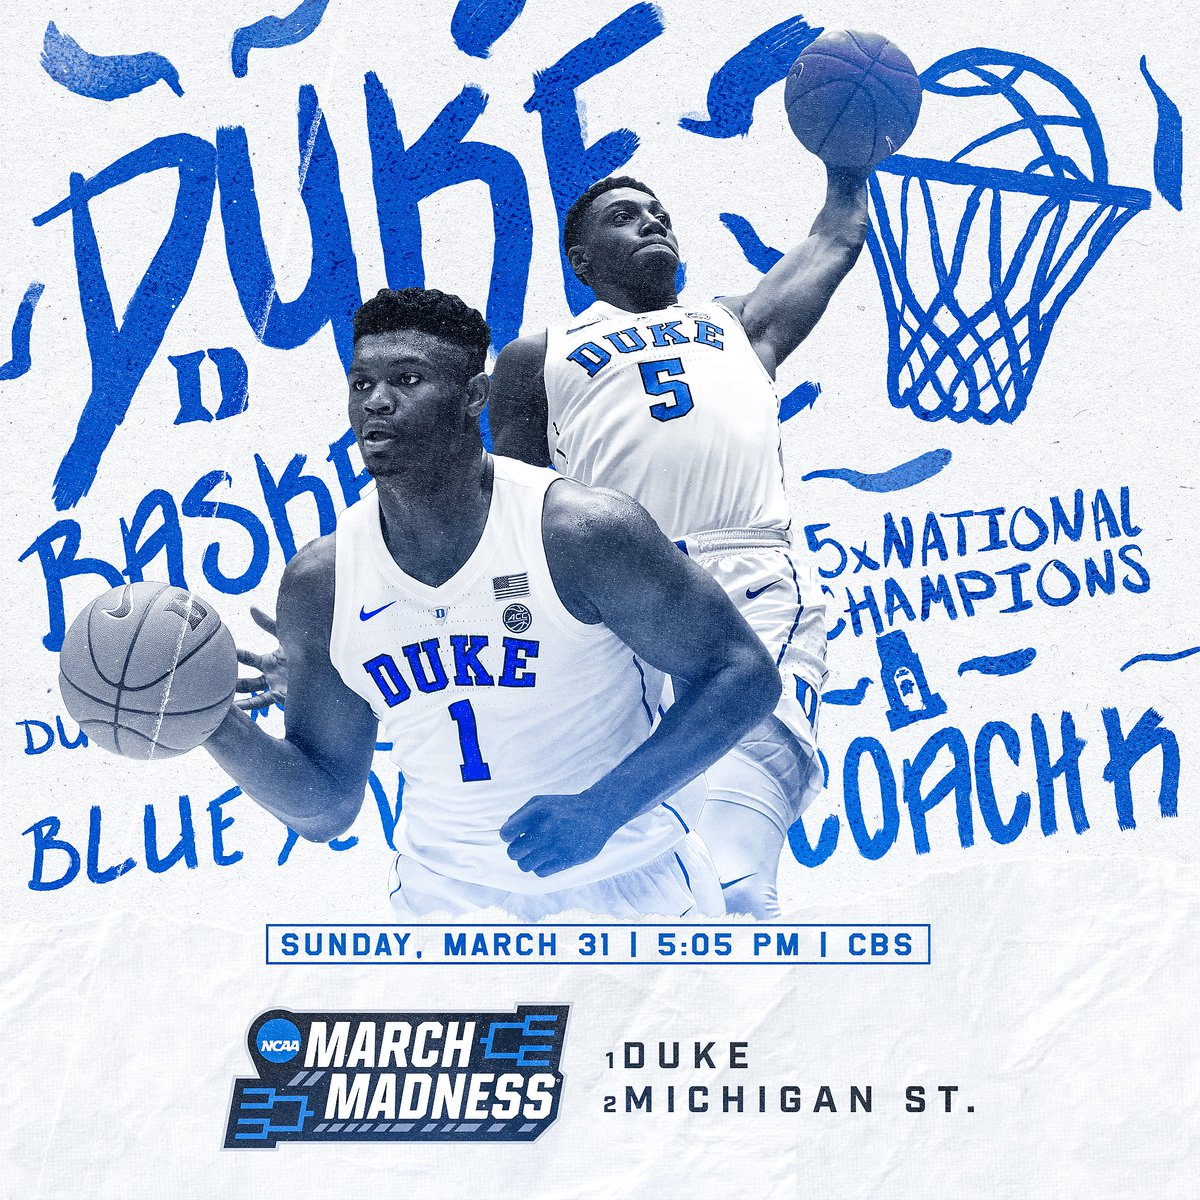 WHO YA GOT!?!? 🏀🚀💦#MarchMadness #Duke #Sparty #BewareTheIdesOfMarch #CoachK #classic #podcast   RT for Duke  Like for MSU